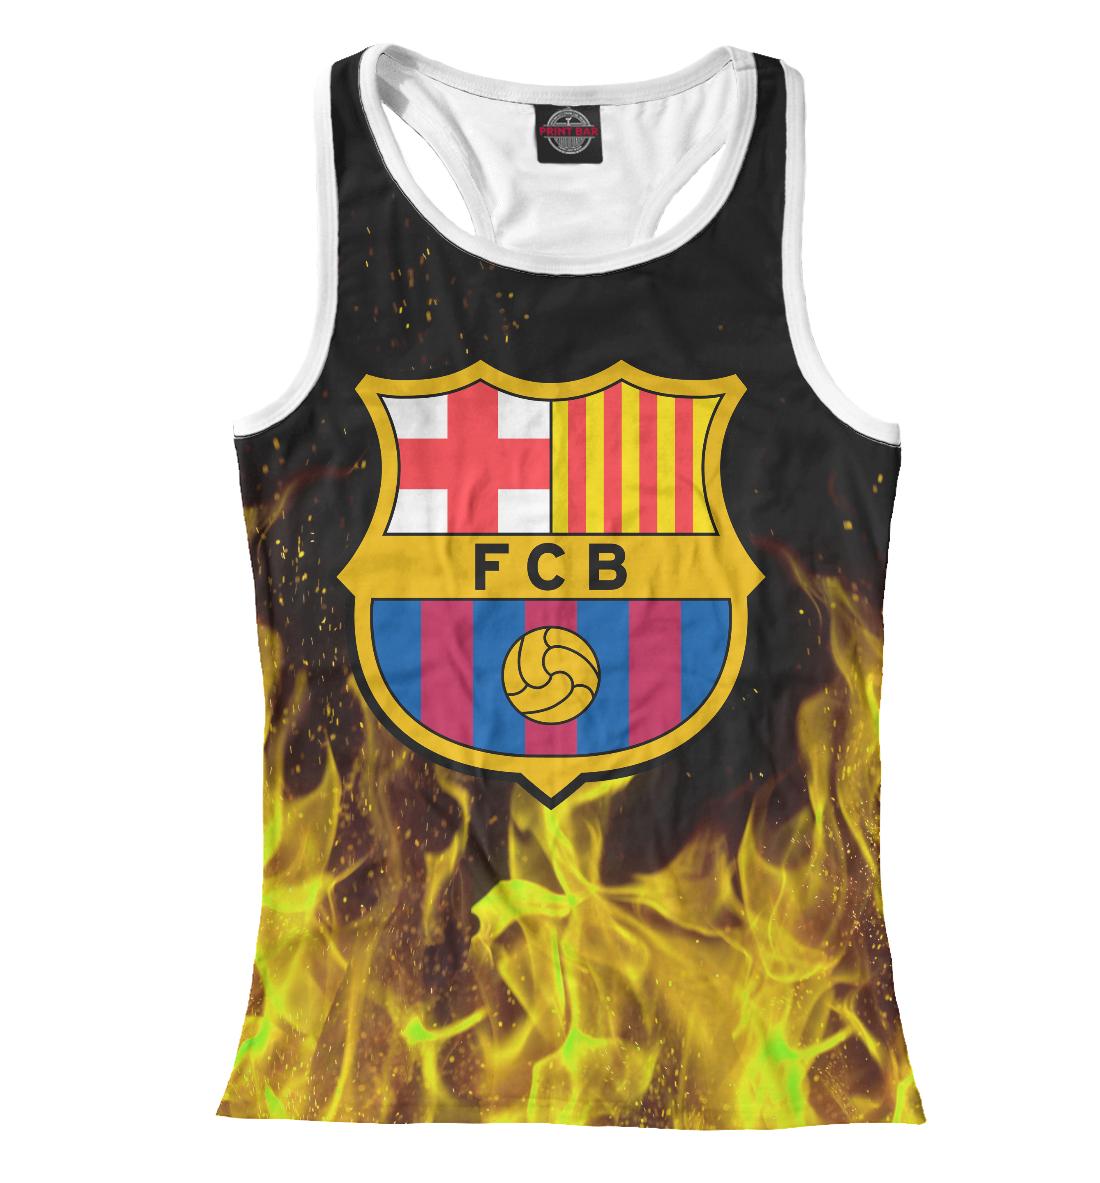 Купить Барселона Fire, Printbar, Майки борцовки, BAR-819509-mayb-1